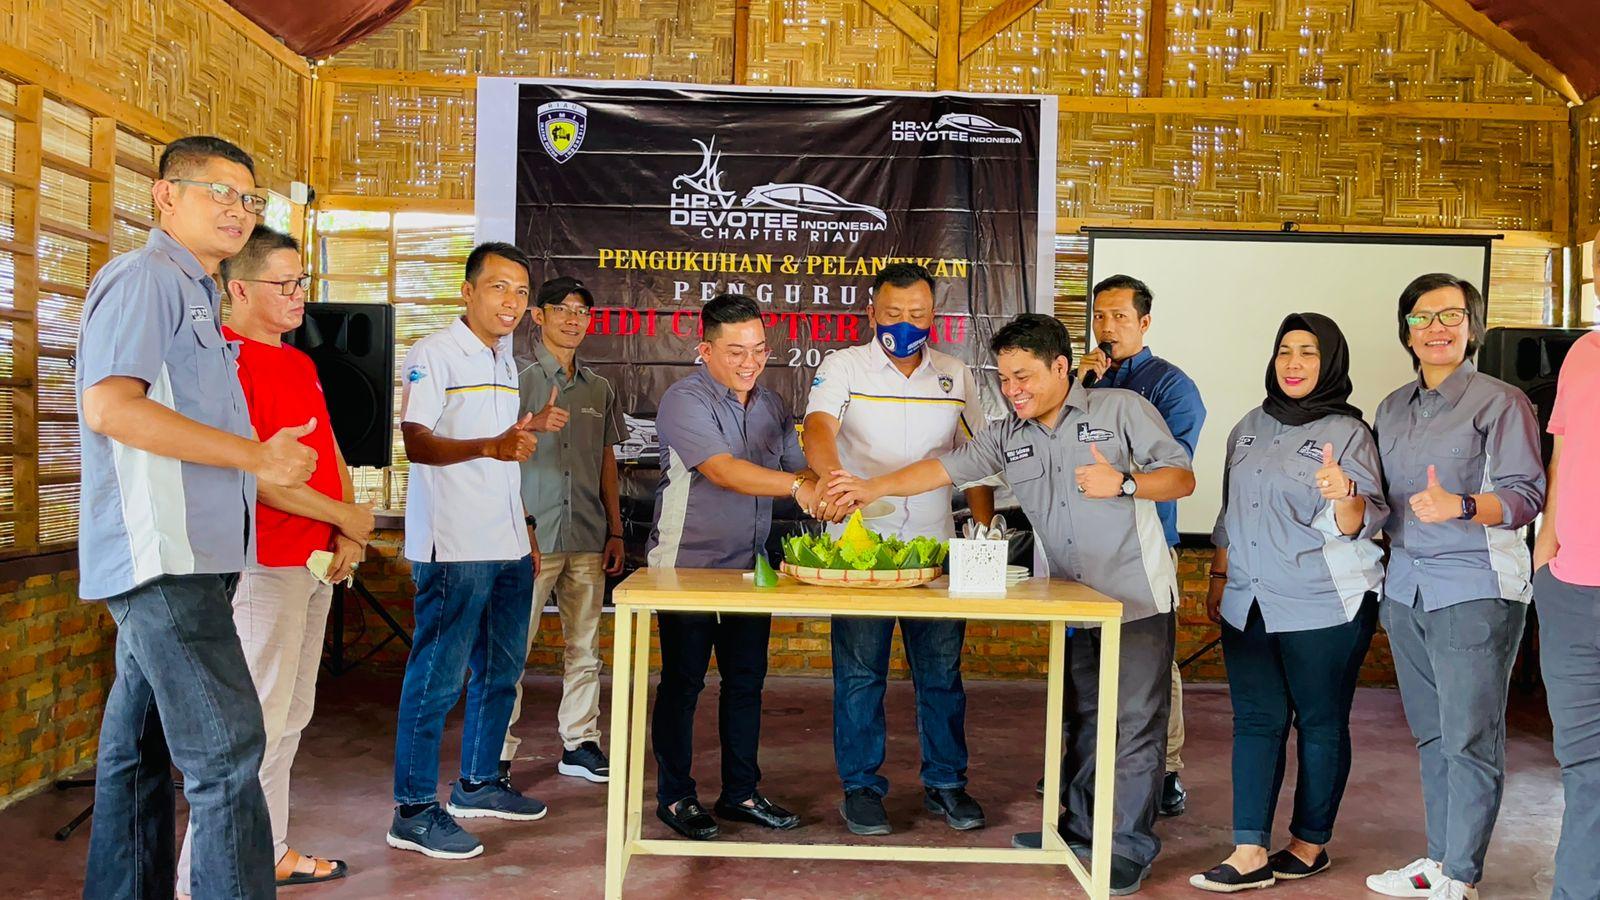 Ketua HRV Devotee Indonesia Chapter Riau Resmi Dilantik